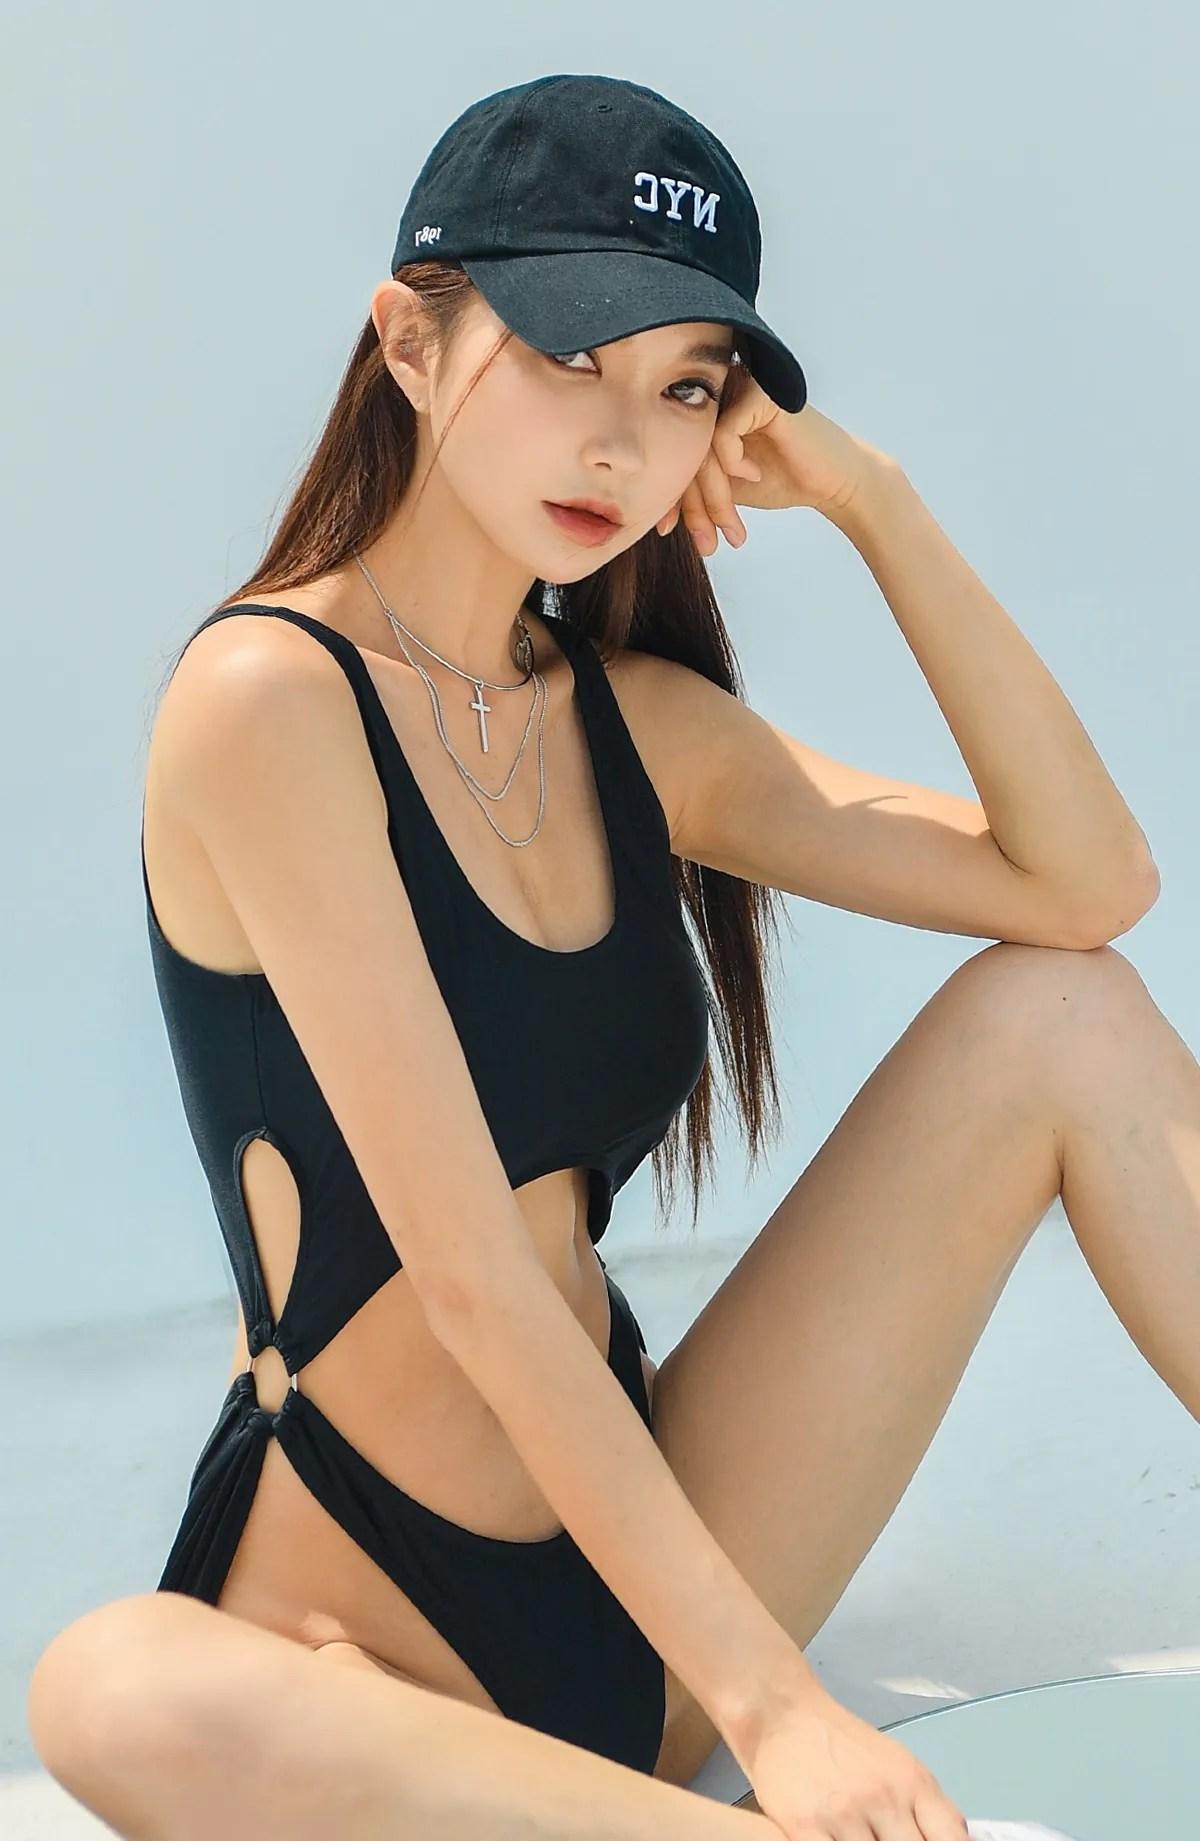 Park Suyeon / vendis / September 2021 / Kir Monokini